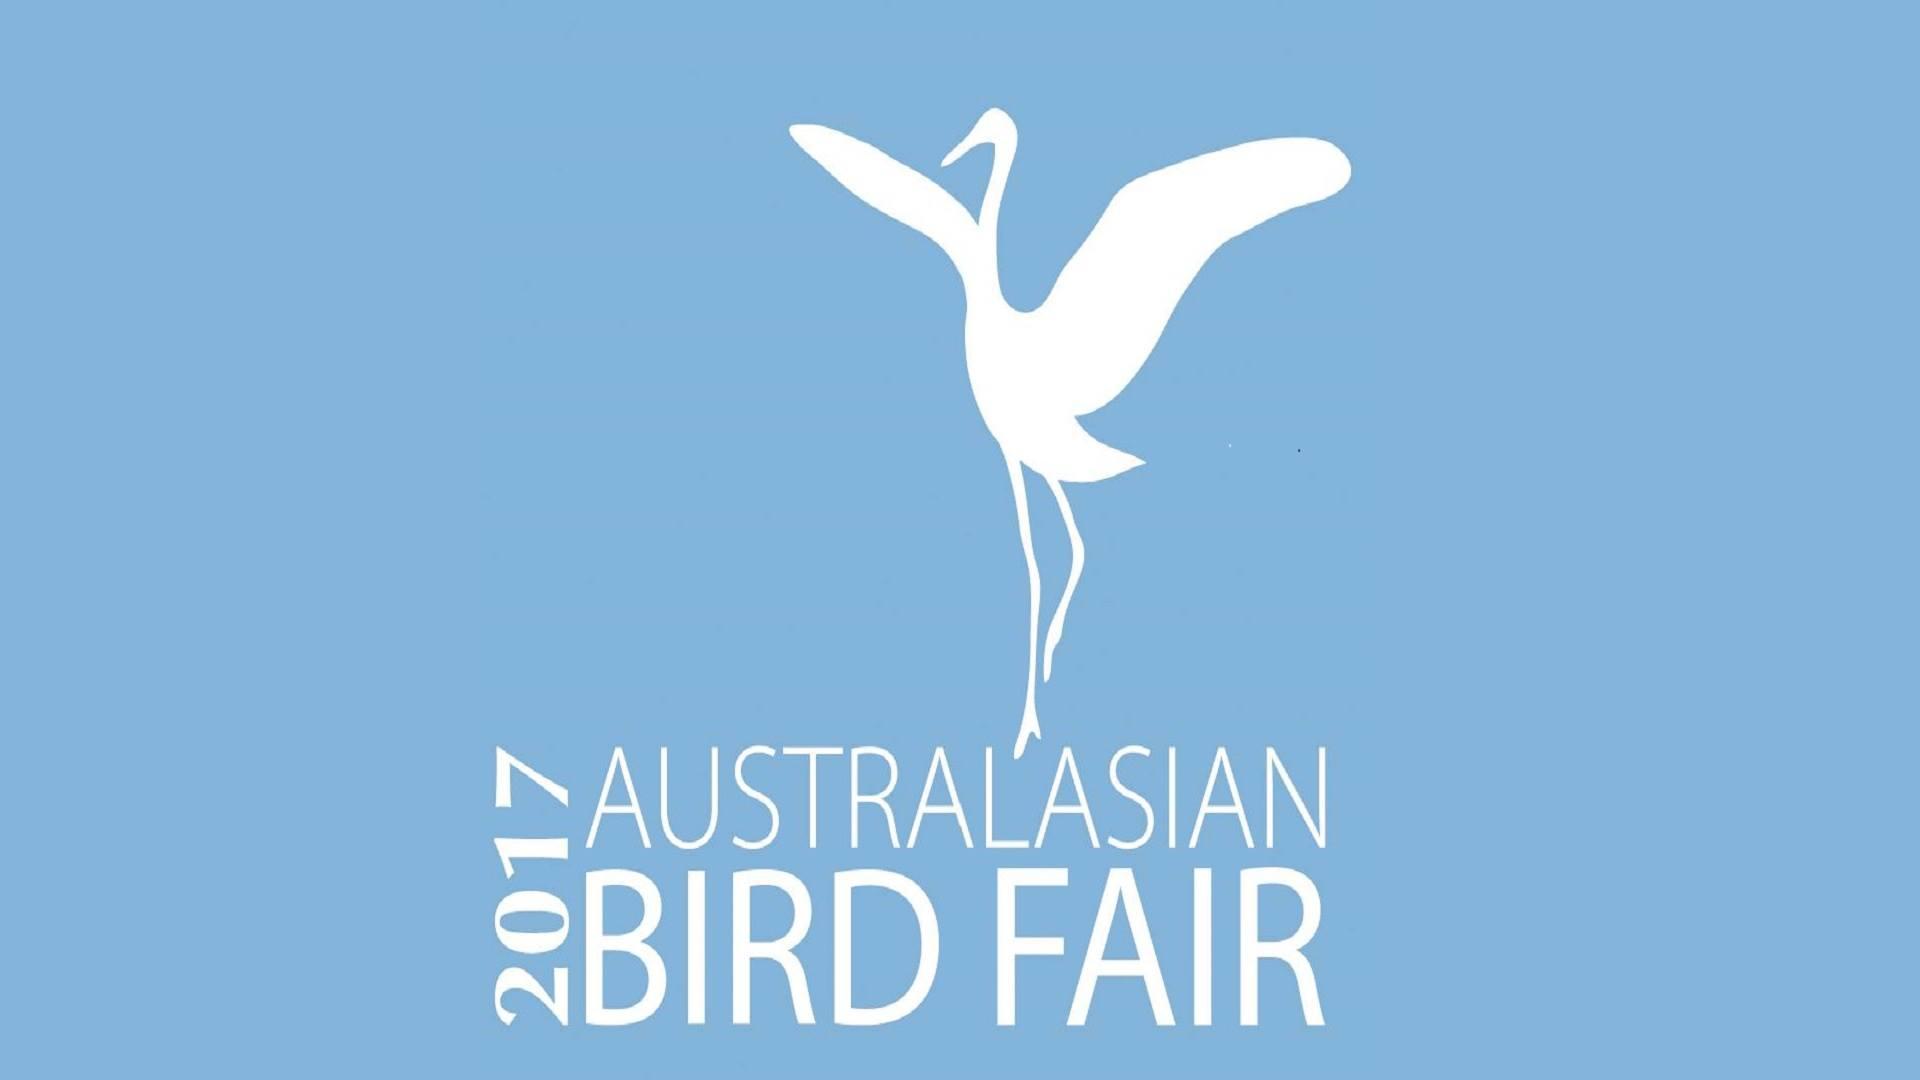 Australasian Bird Fair